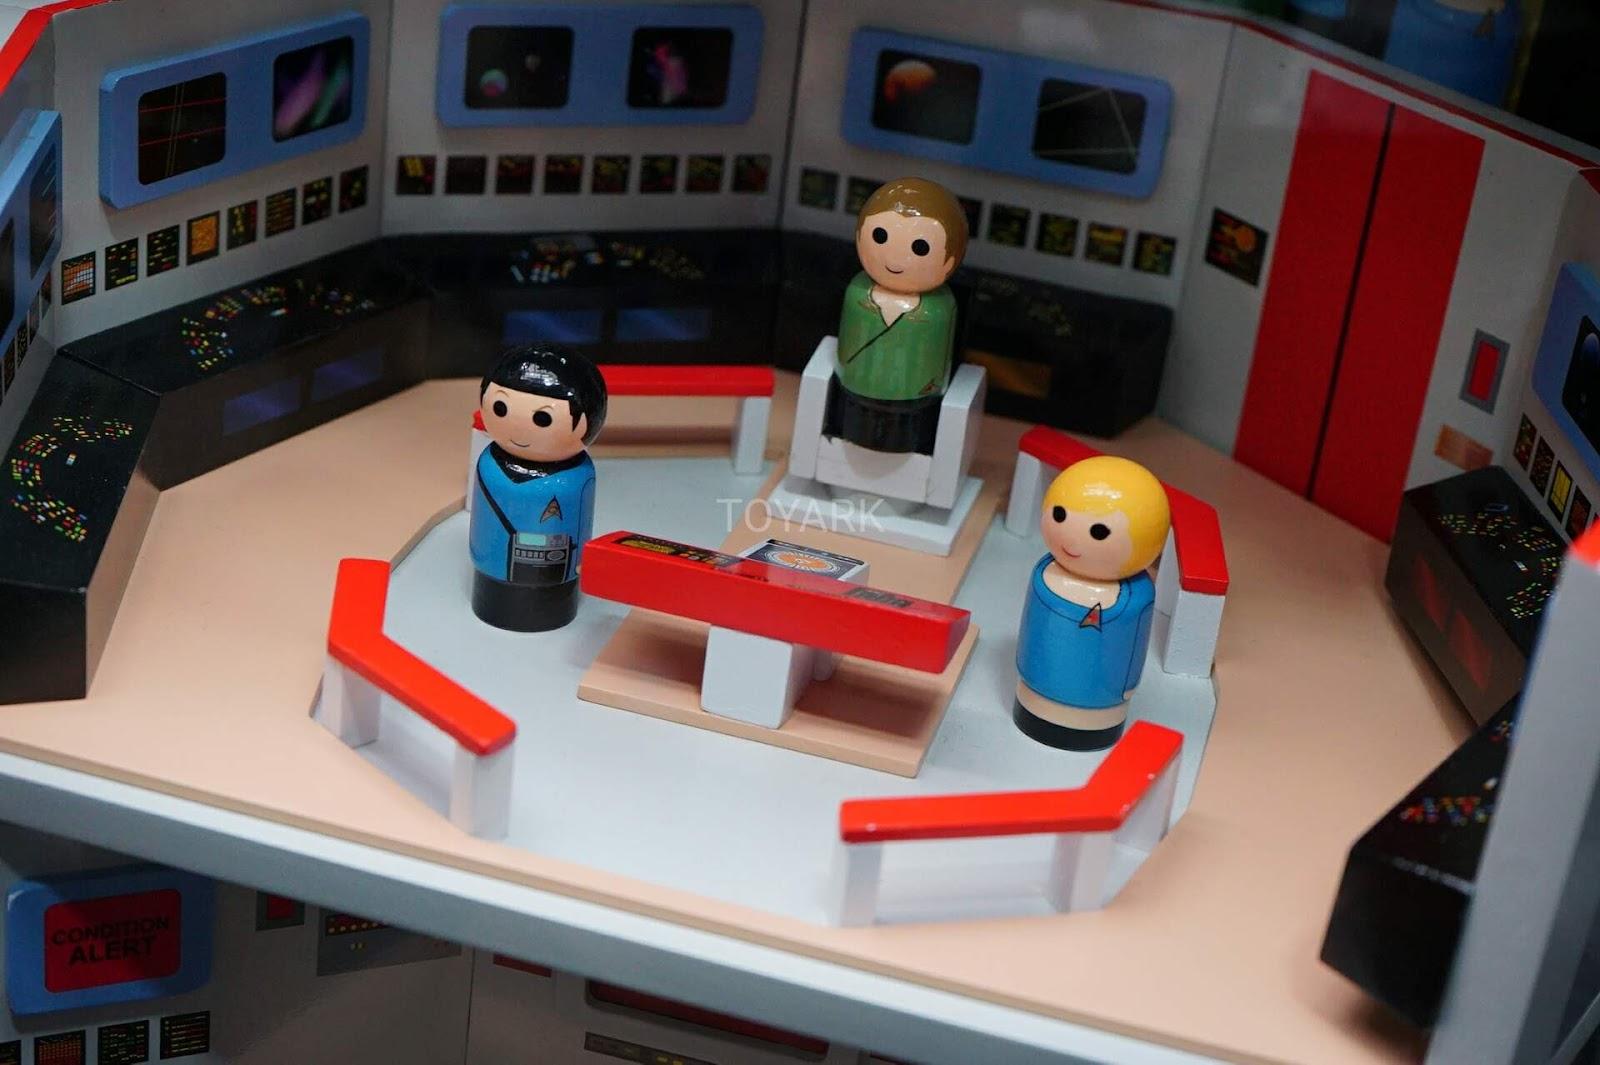 The Trek Collective Super Cute Pin Mates Bridge Playset